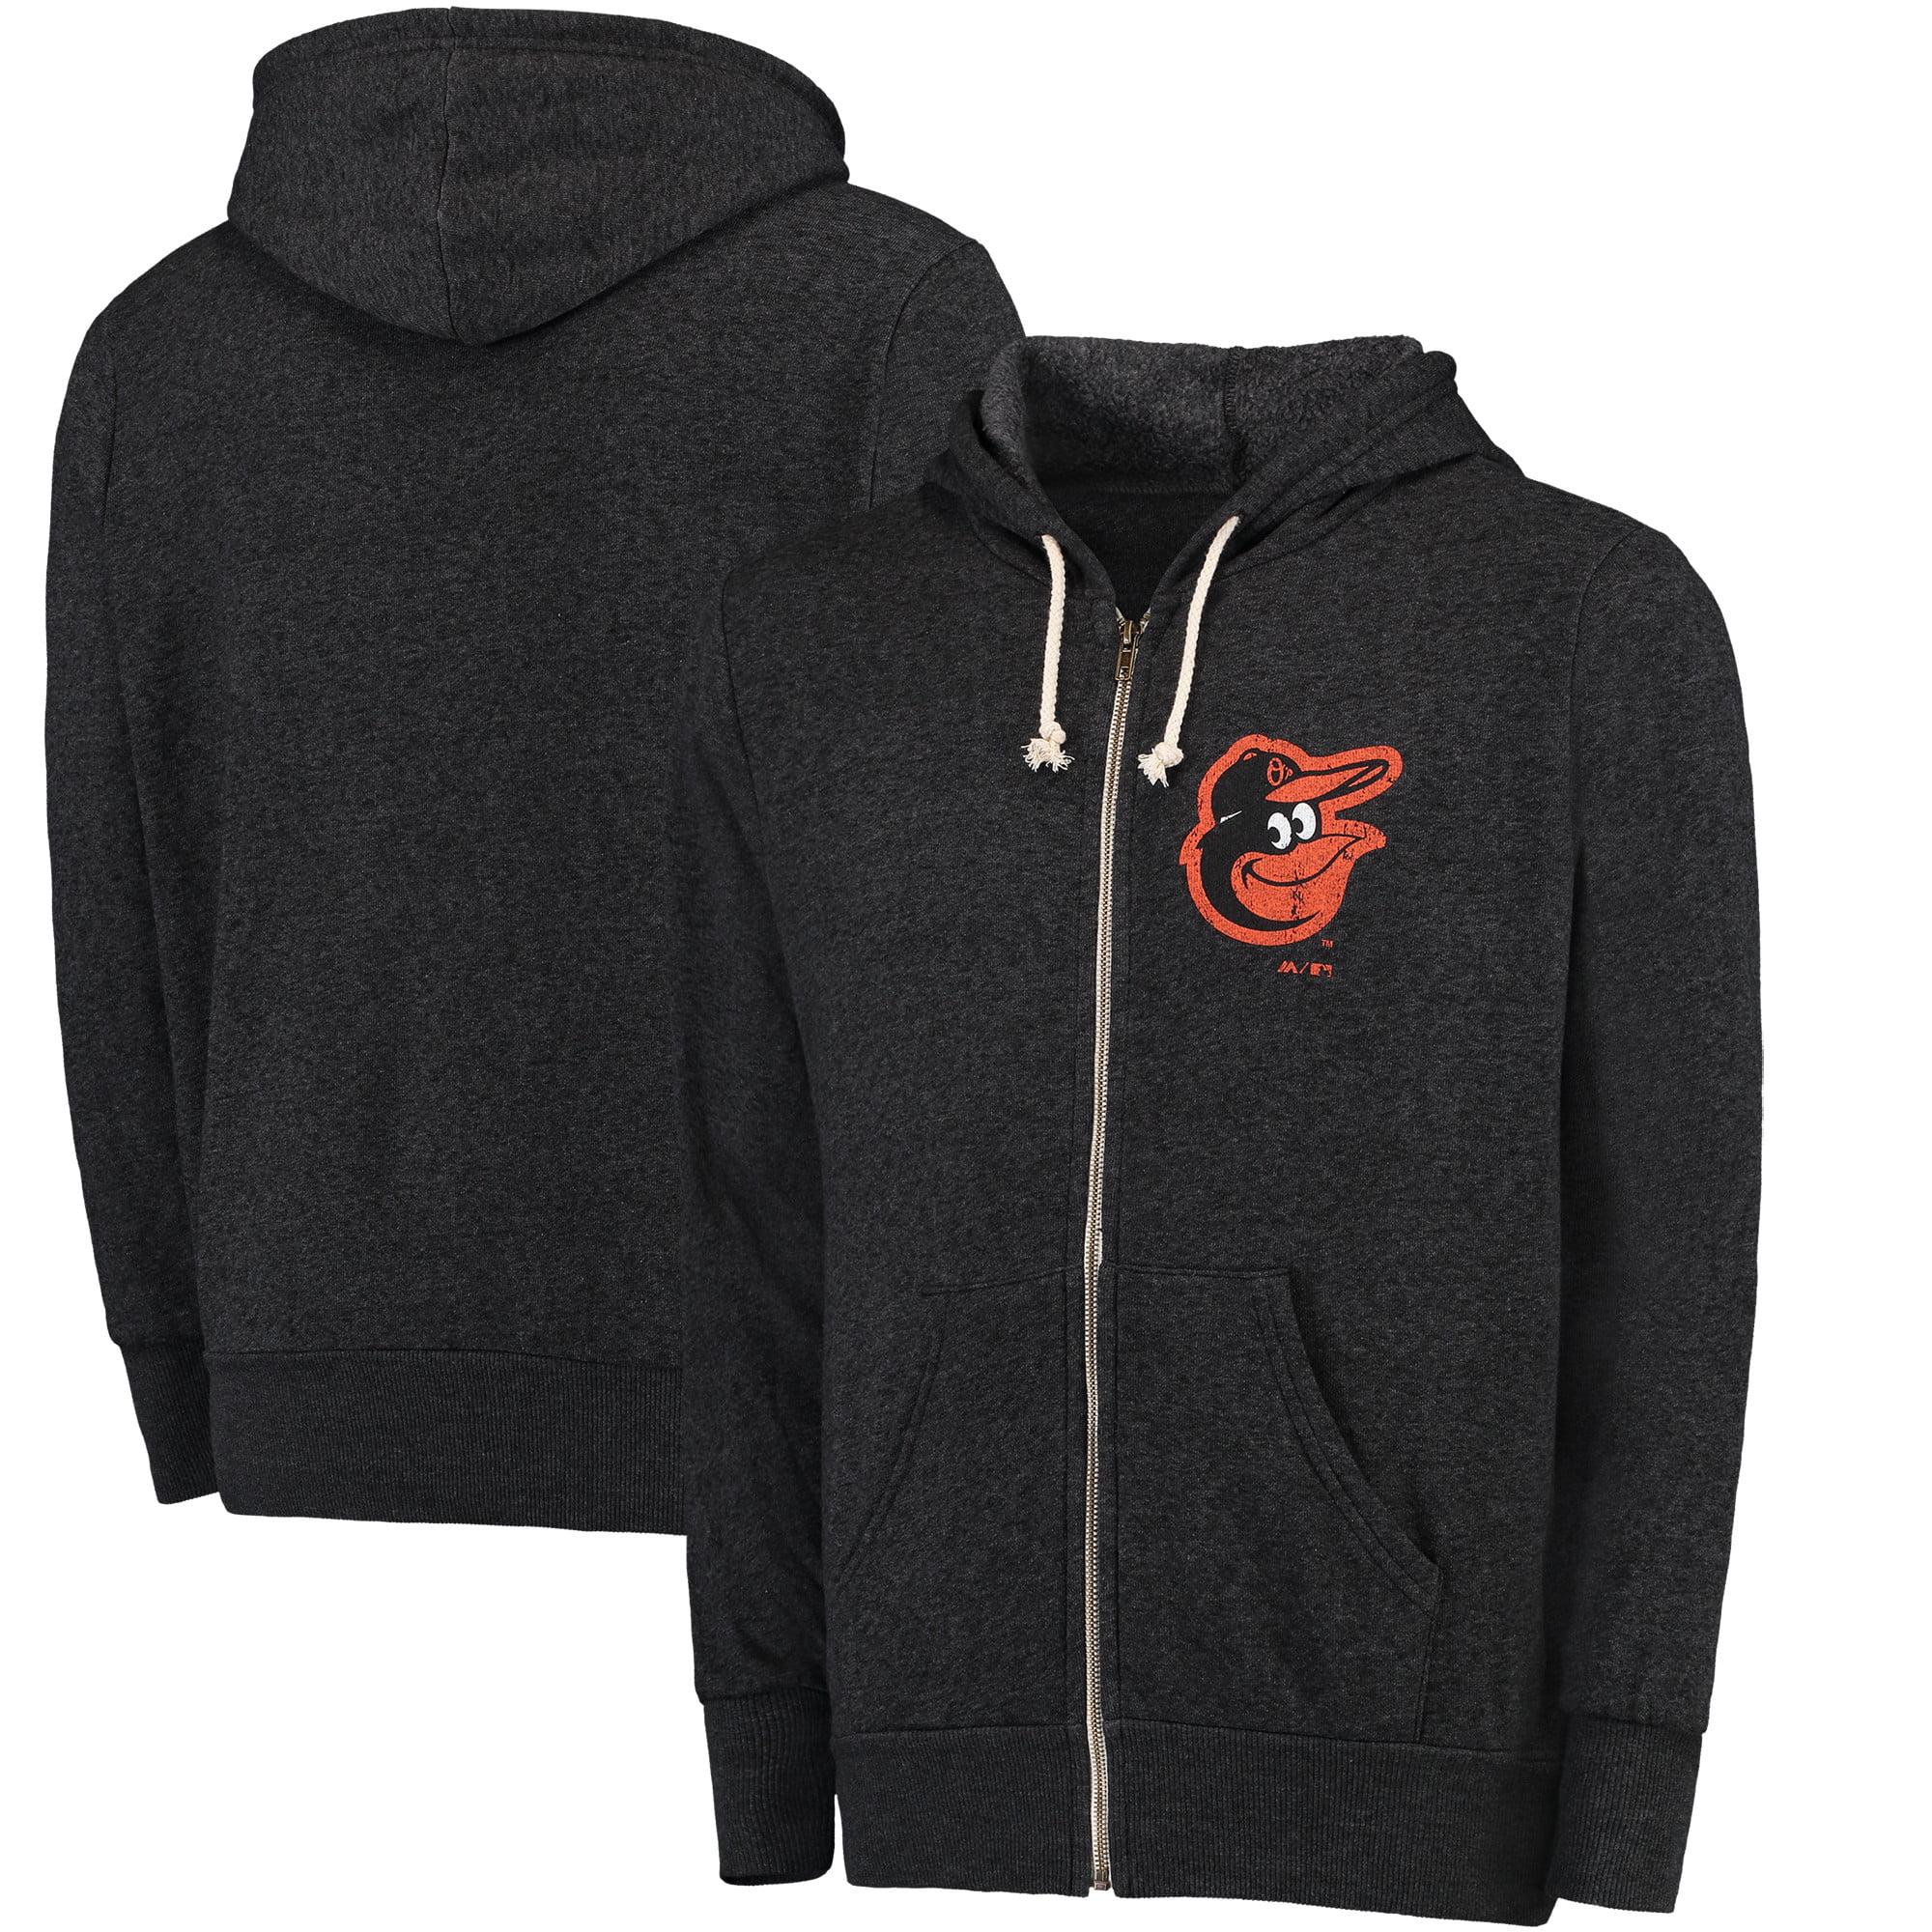 Baltimore Orioles Majestic Threads Distressed Tri-Blend Full-Zip Hoodie - Black